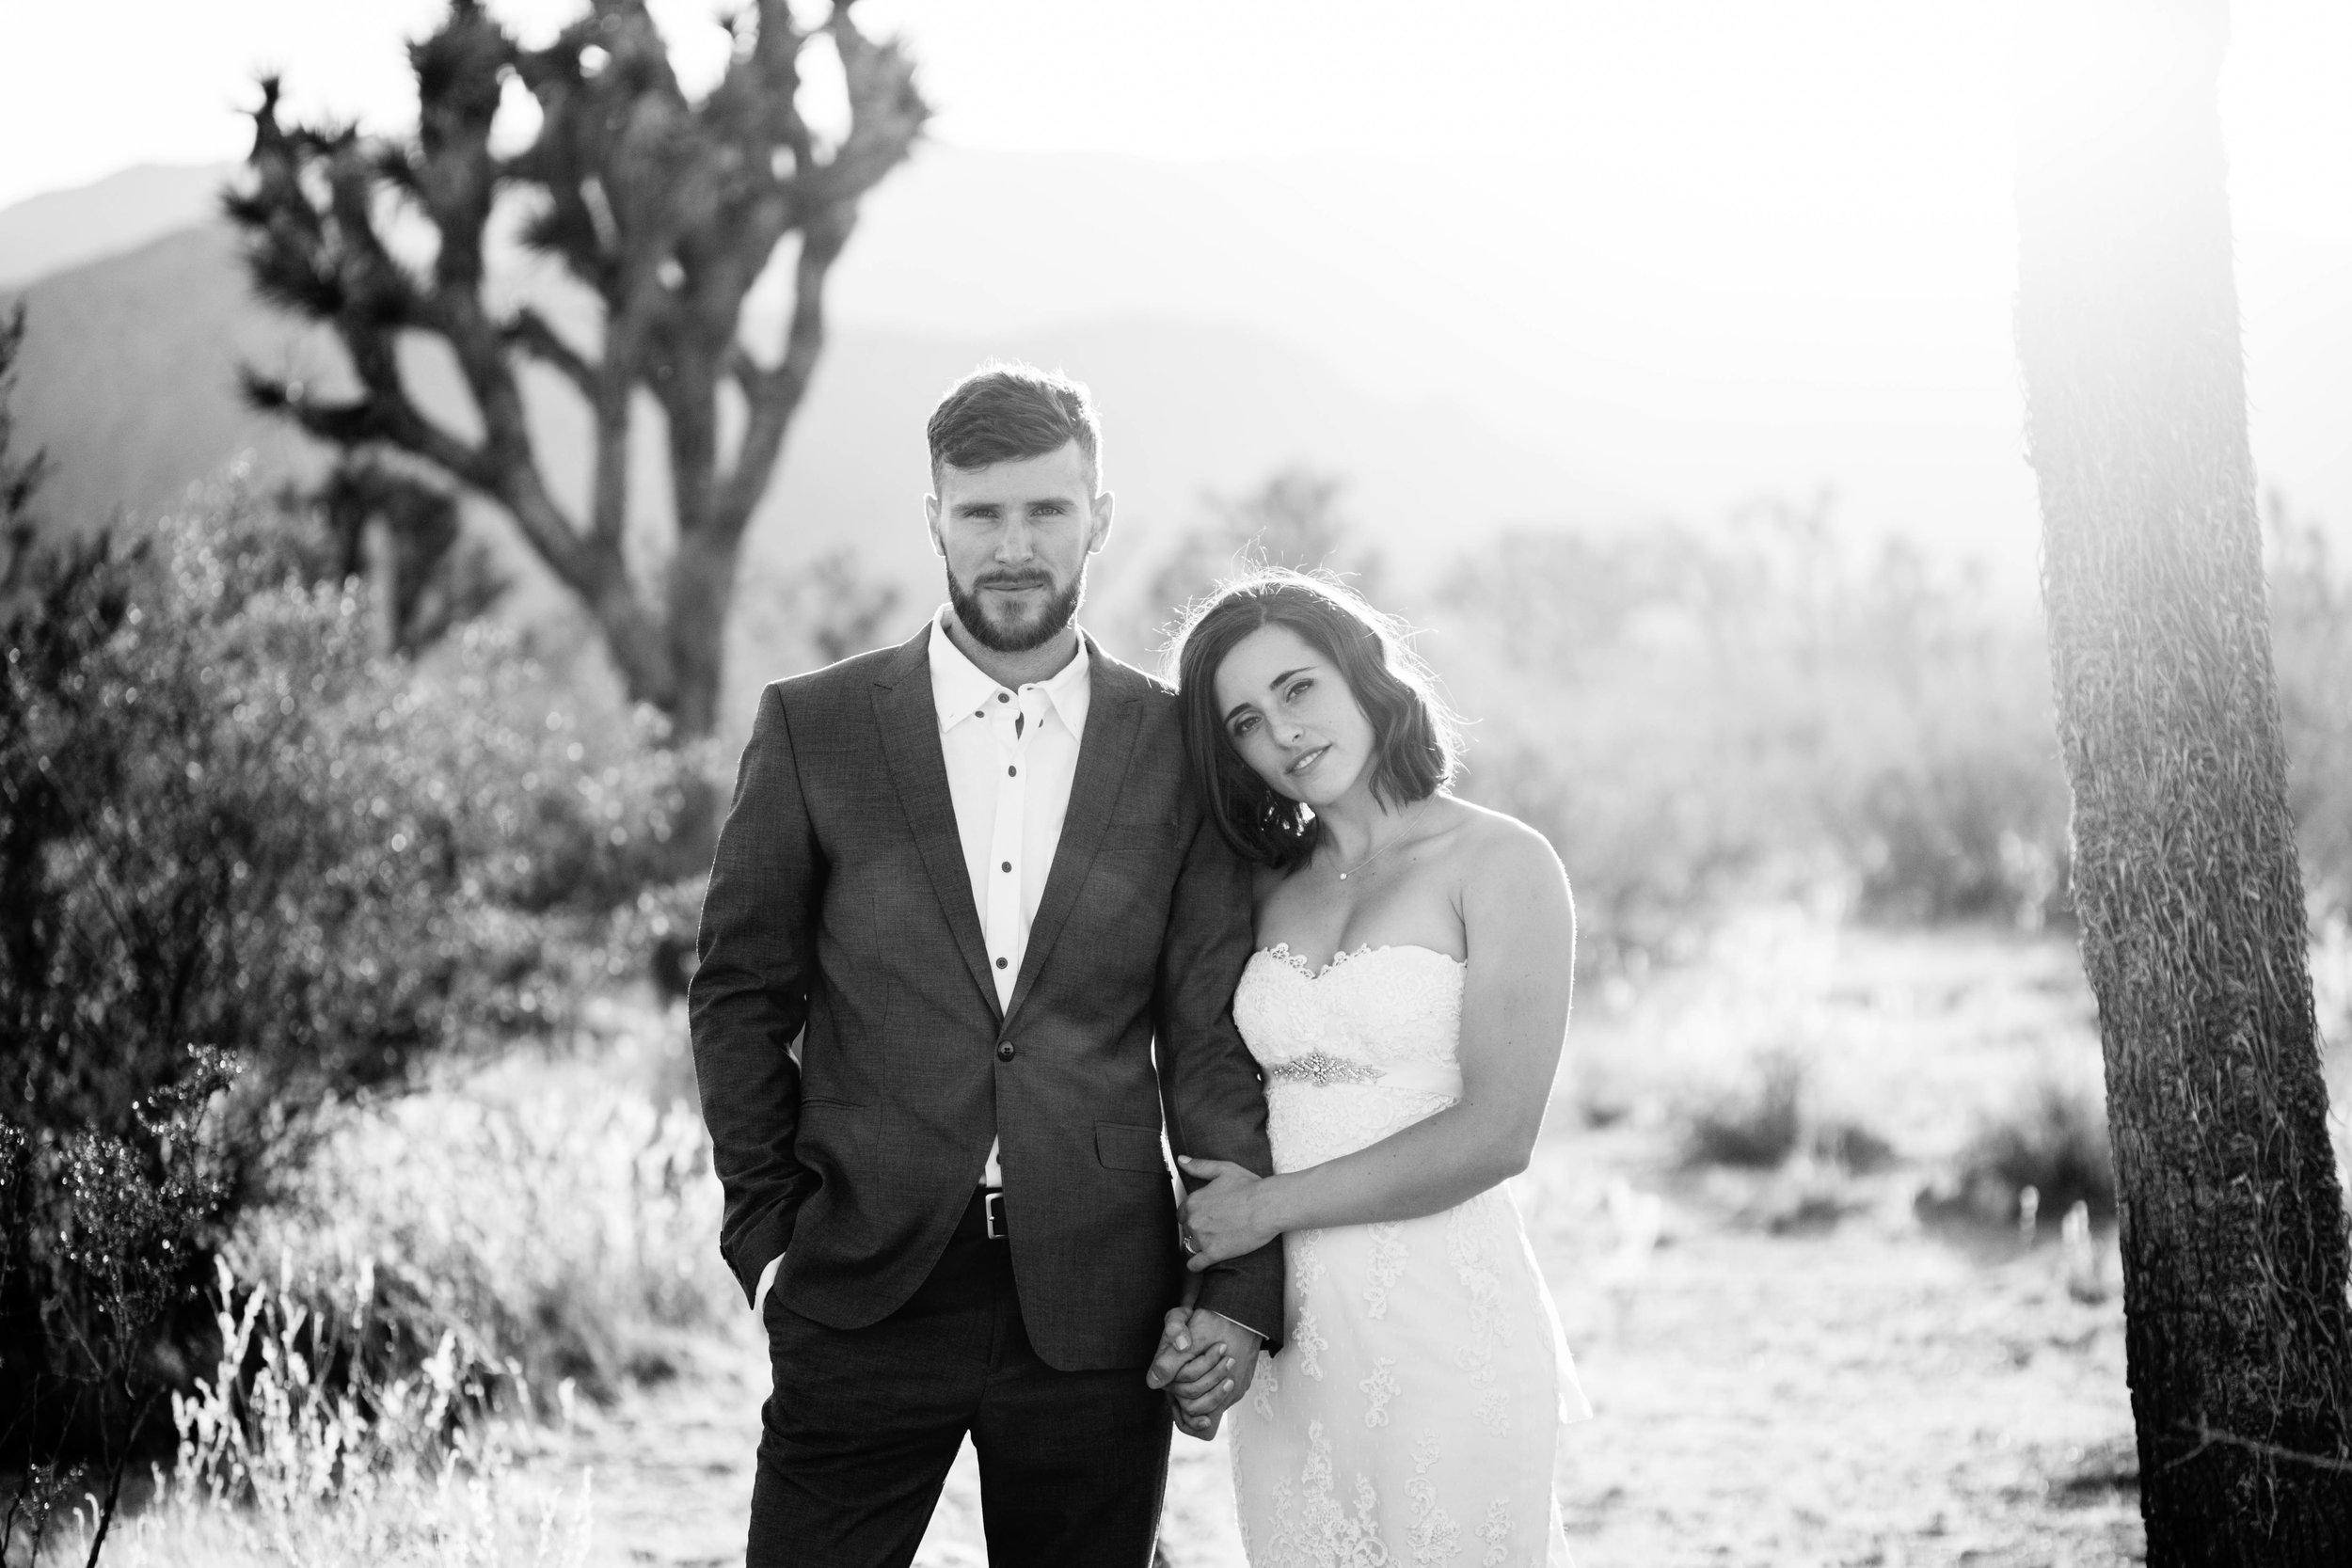 nicole-daacke-photography-joshua-tree-adventurous-elopement-wedding-national-park-wedding-photographer-adventure-wedding-adventurous-elopement-jtree-joshua-tree-national-park-wedding-photographer-intimate-weddings-golden-desert-love-10.jpg